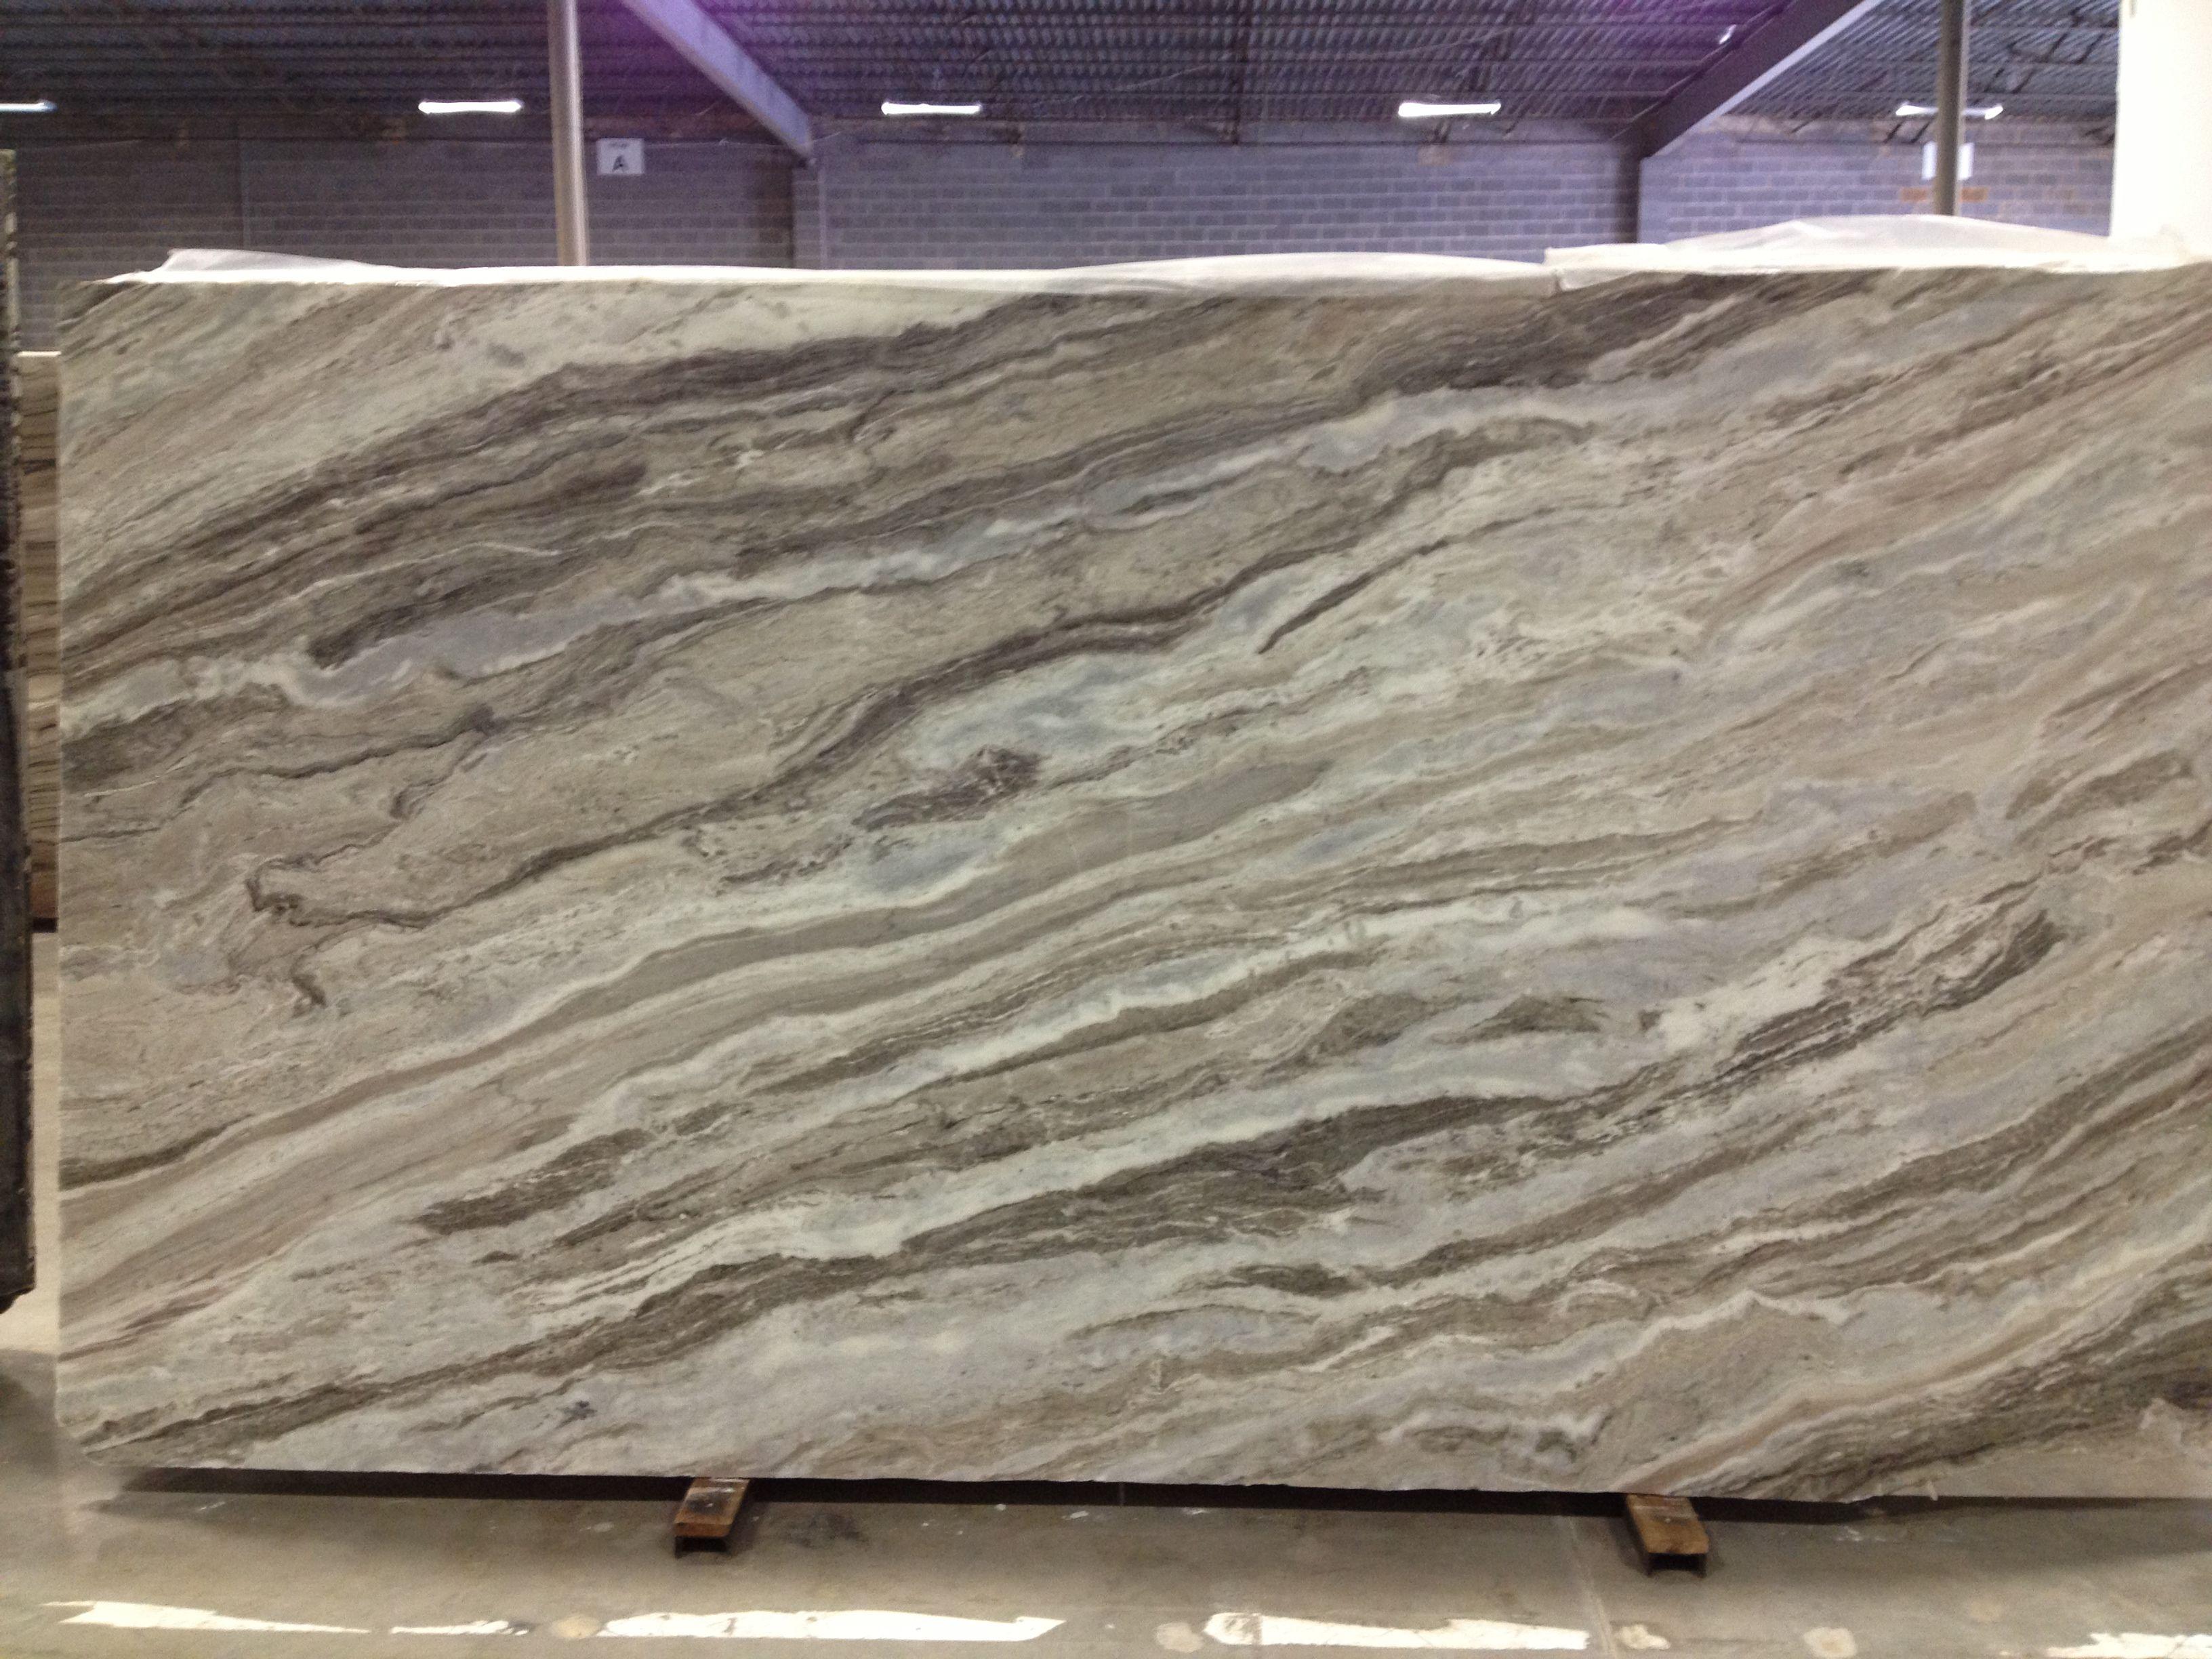 Bianca Jewel Fantasy Brown Soft Quartzite Slab Countertops